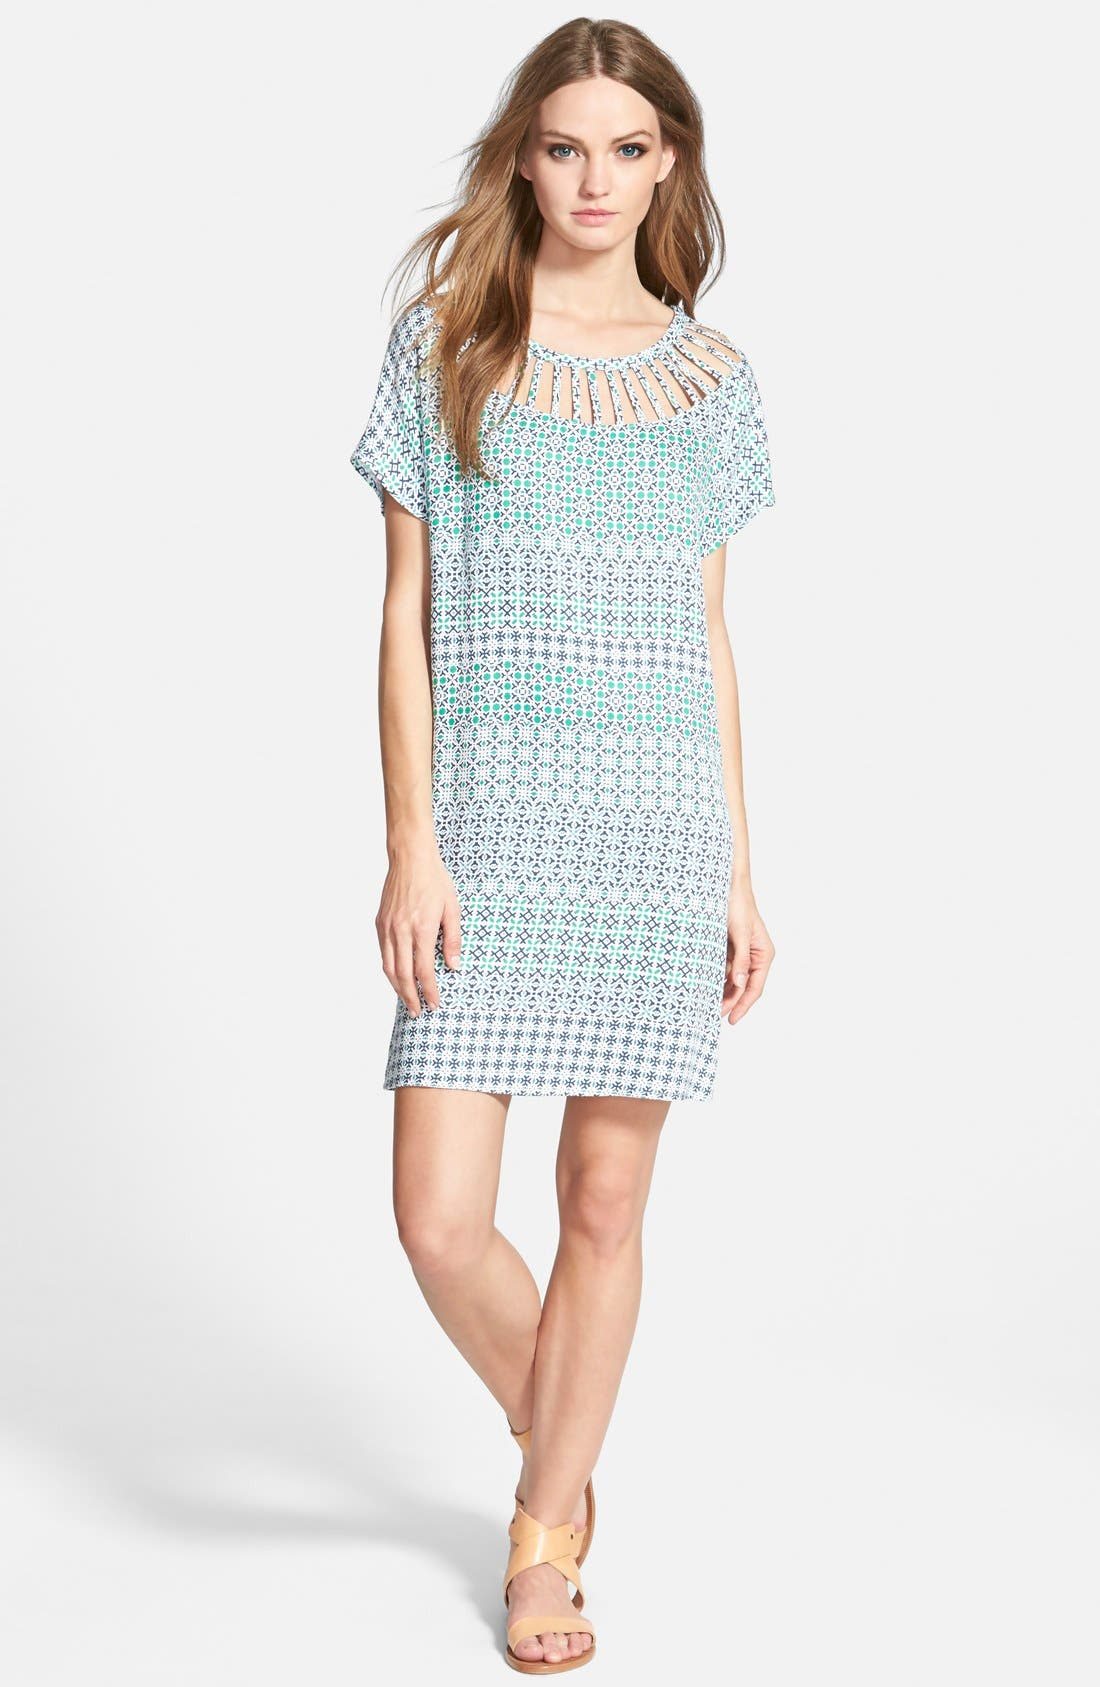 ELLA MOSS 'Mozaic' Short Sleeve Shift Dress, Main, color, 300